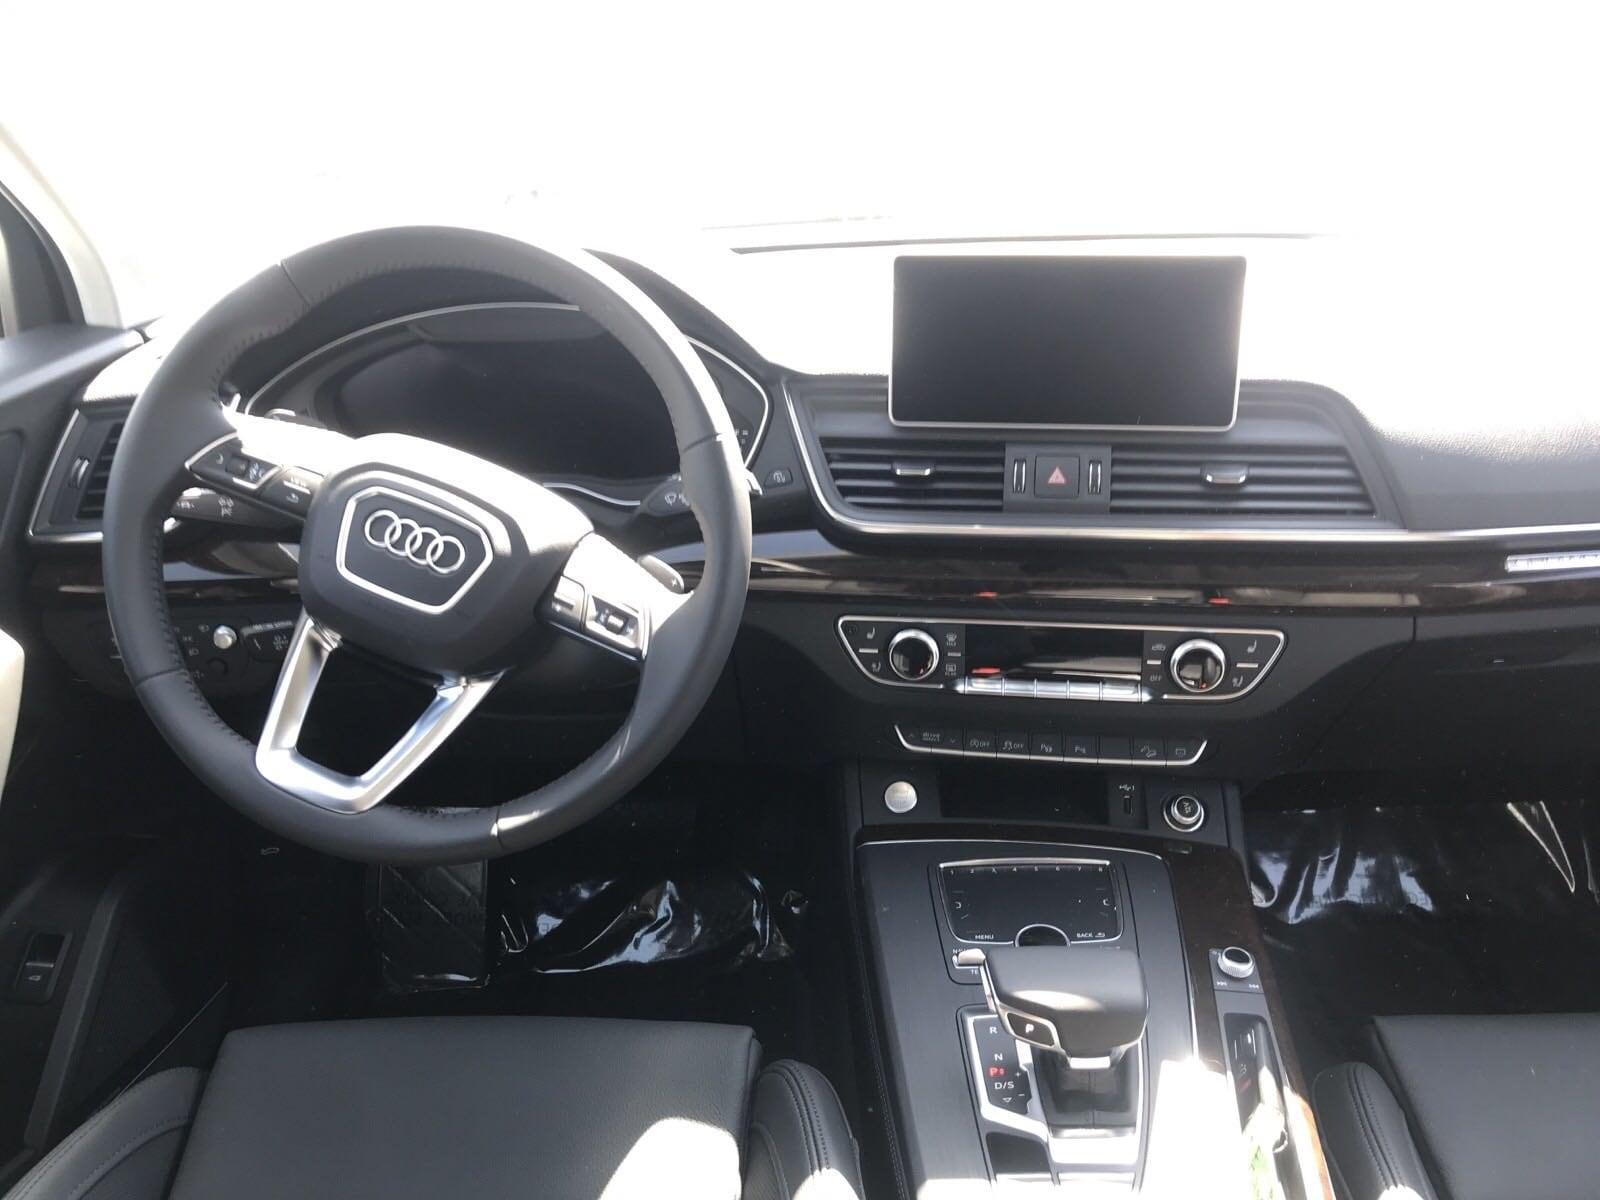 New 2019 Audi Q5 2 0T Prestige | Layton UT | Serving